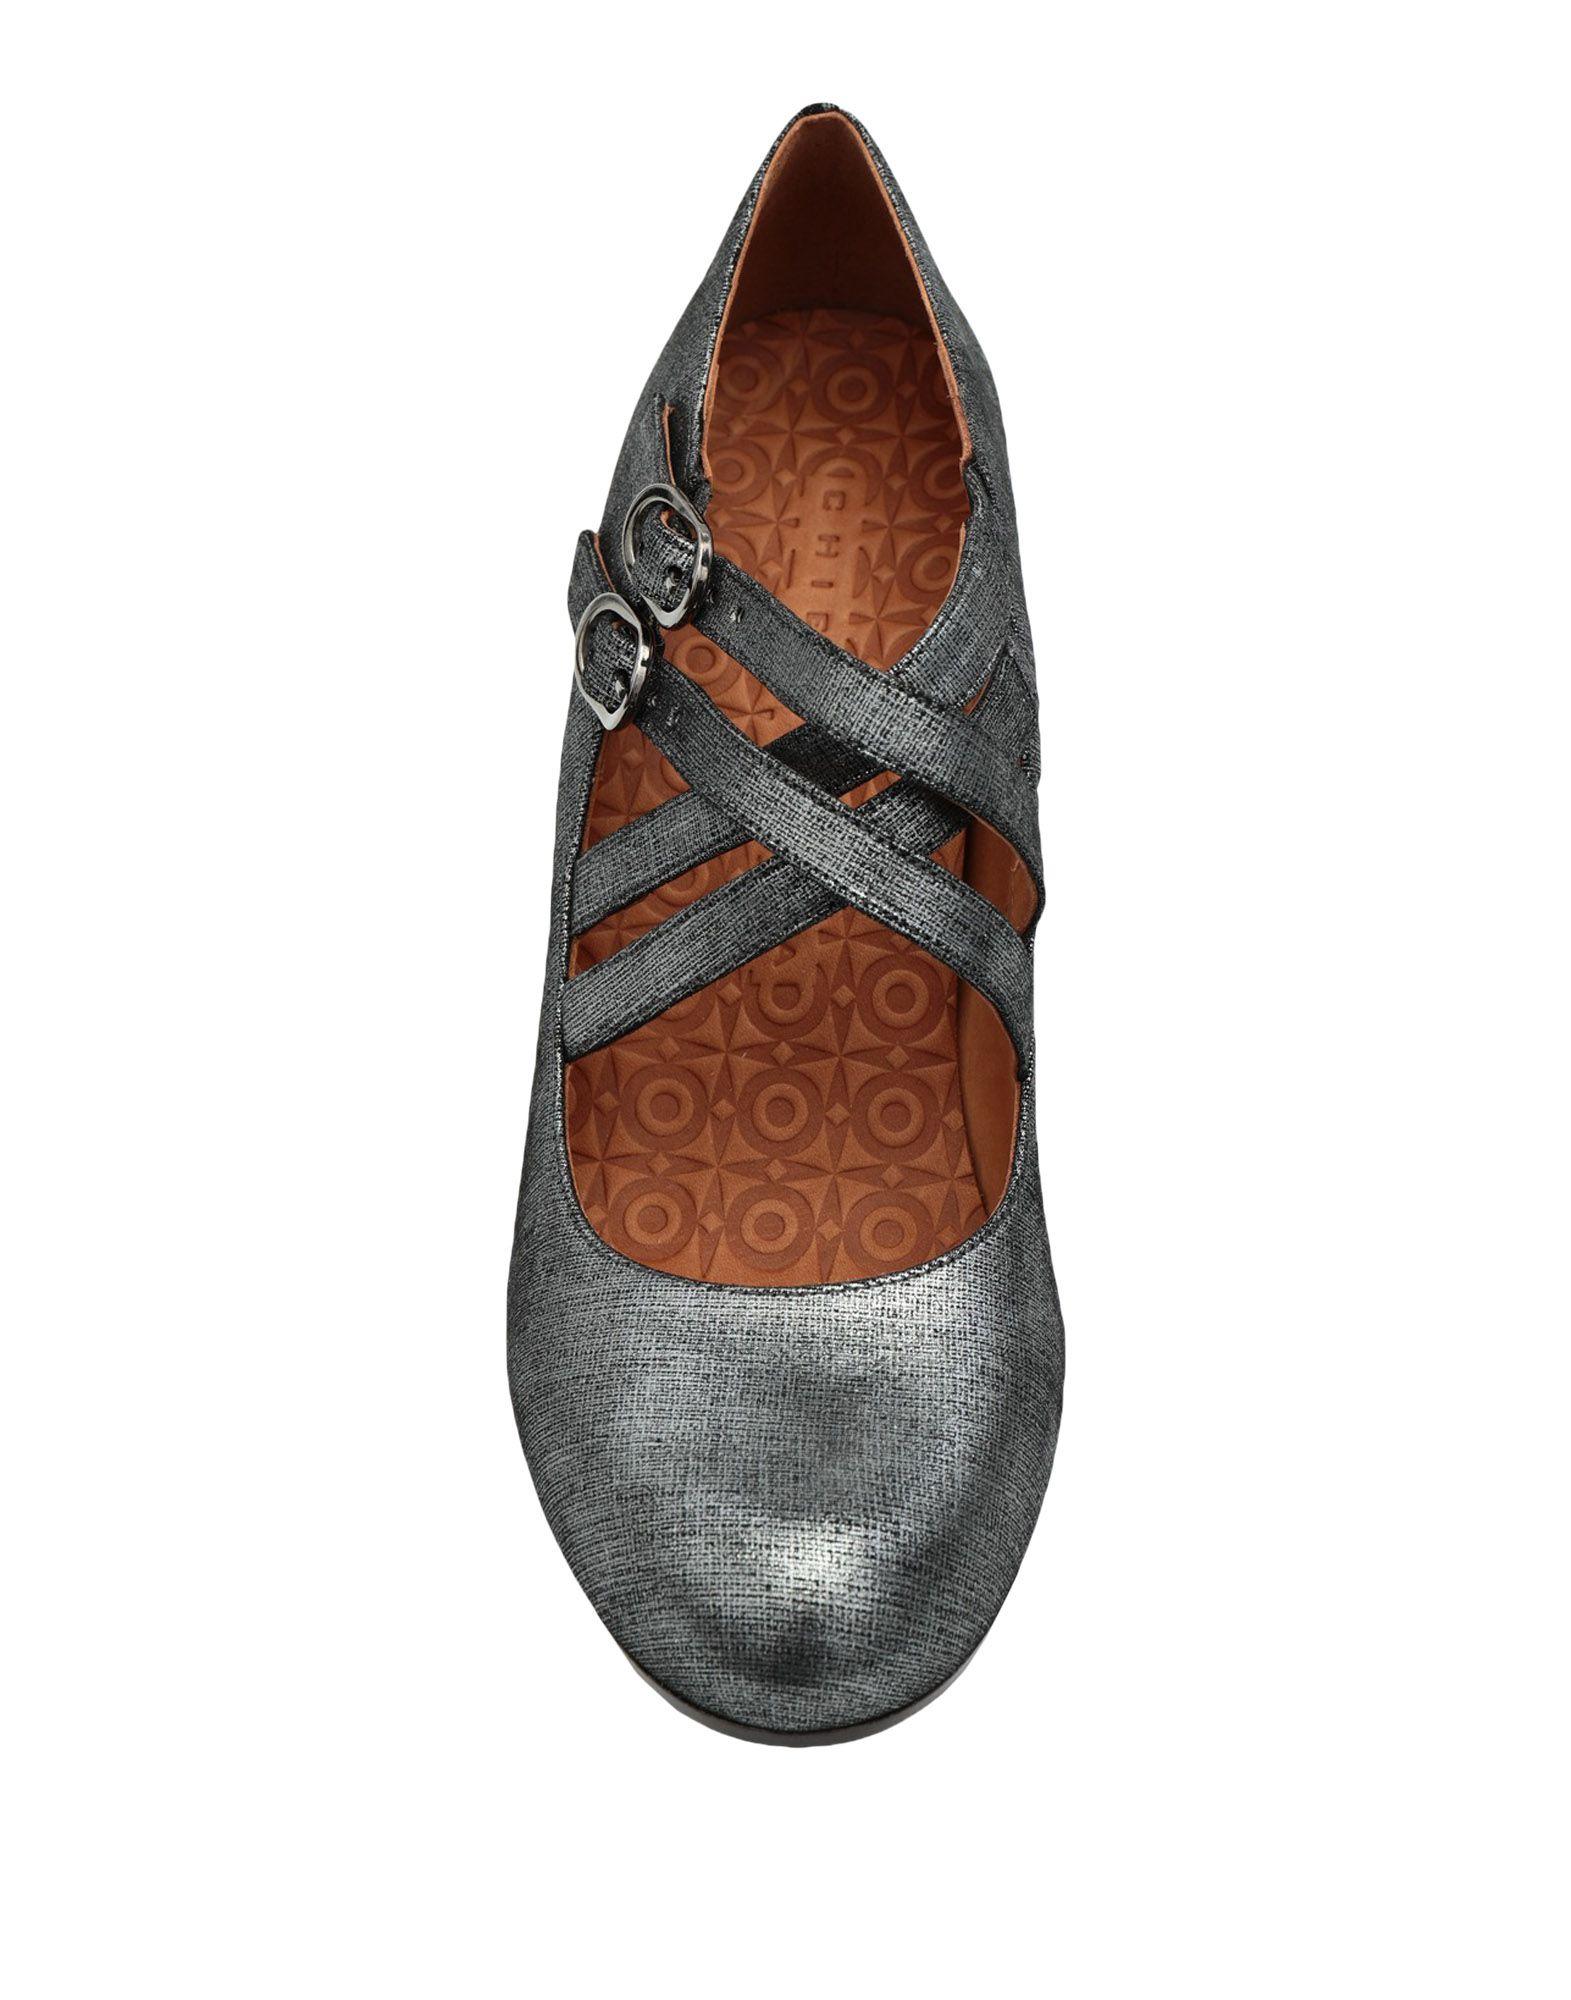 Rabatt Damen Schuhe Chie Mihara Pumps Damen Rabatt  11549137ON f83aeb